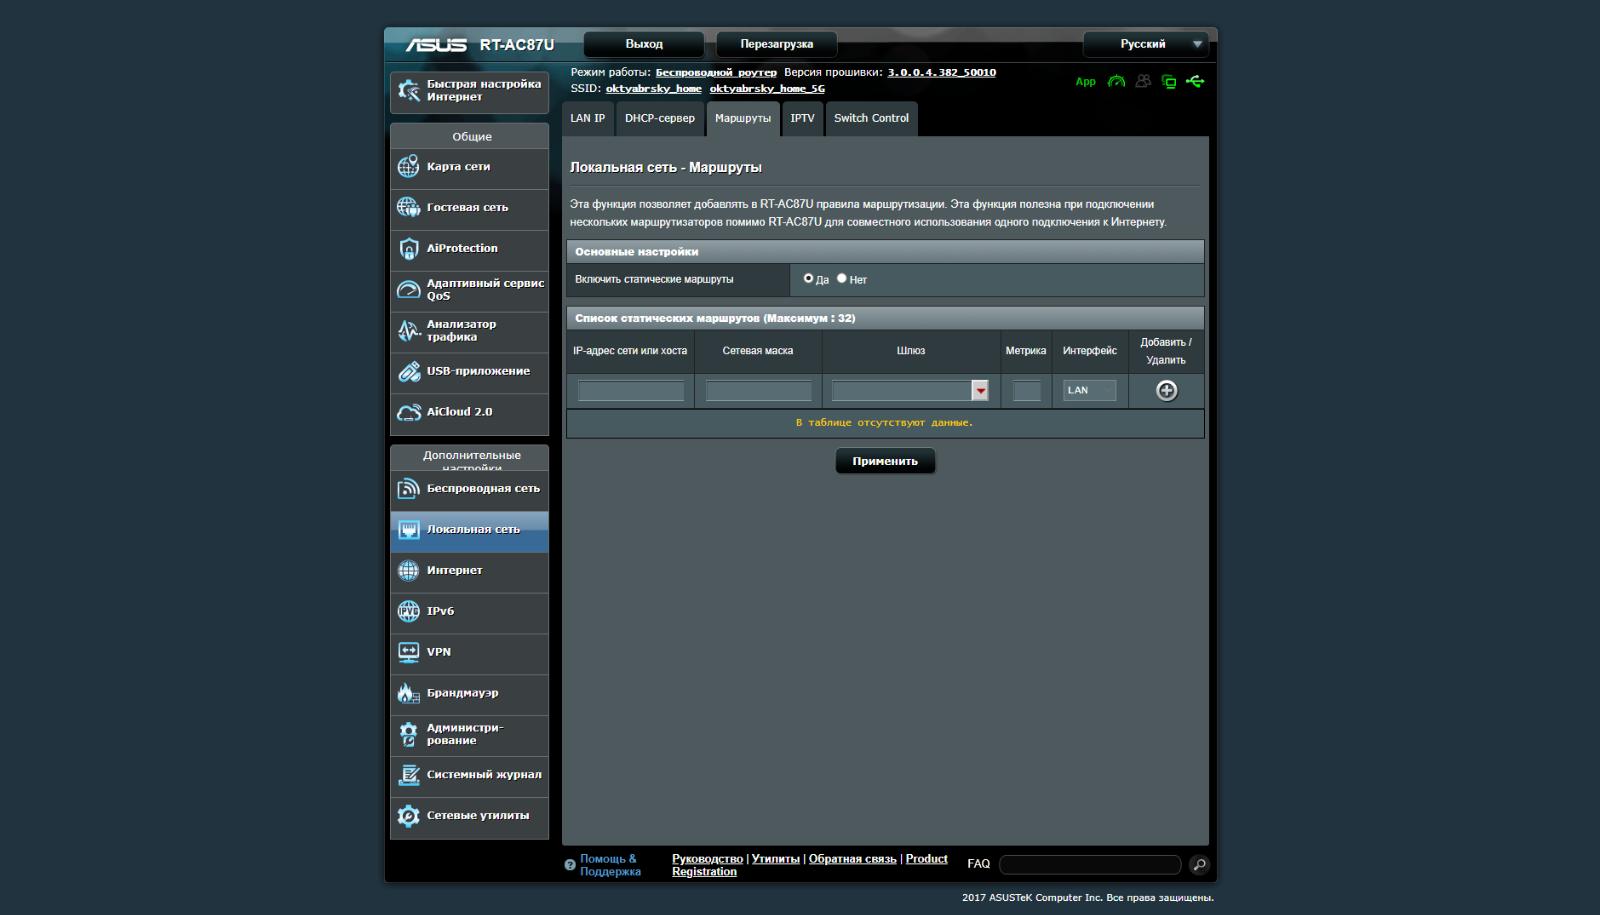 router.asus.comscreencapture2018-03-10_11-43-35.png